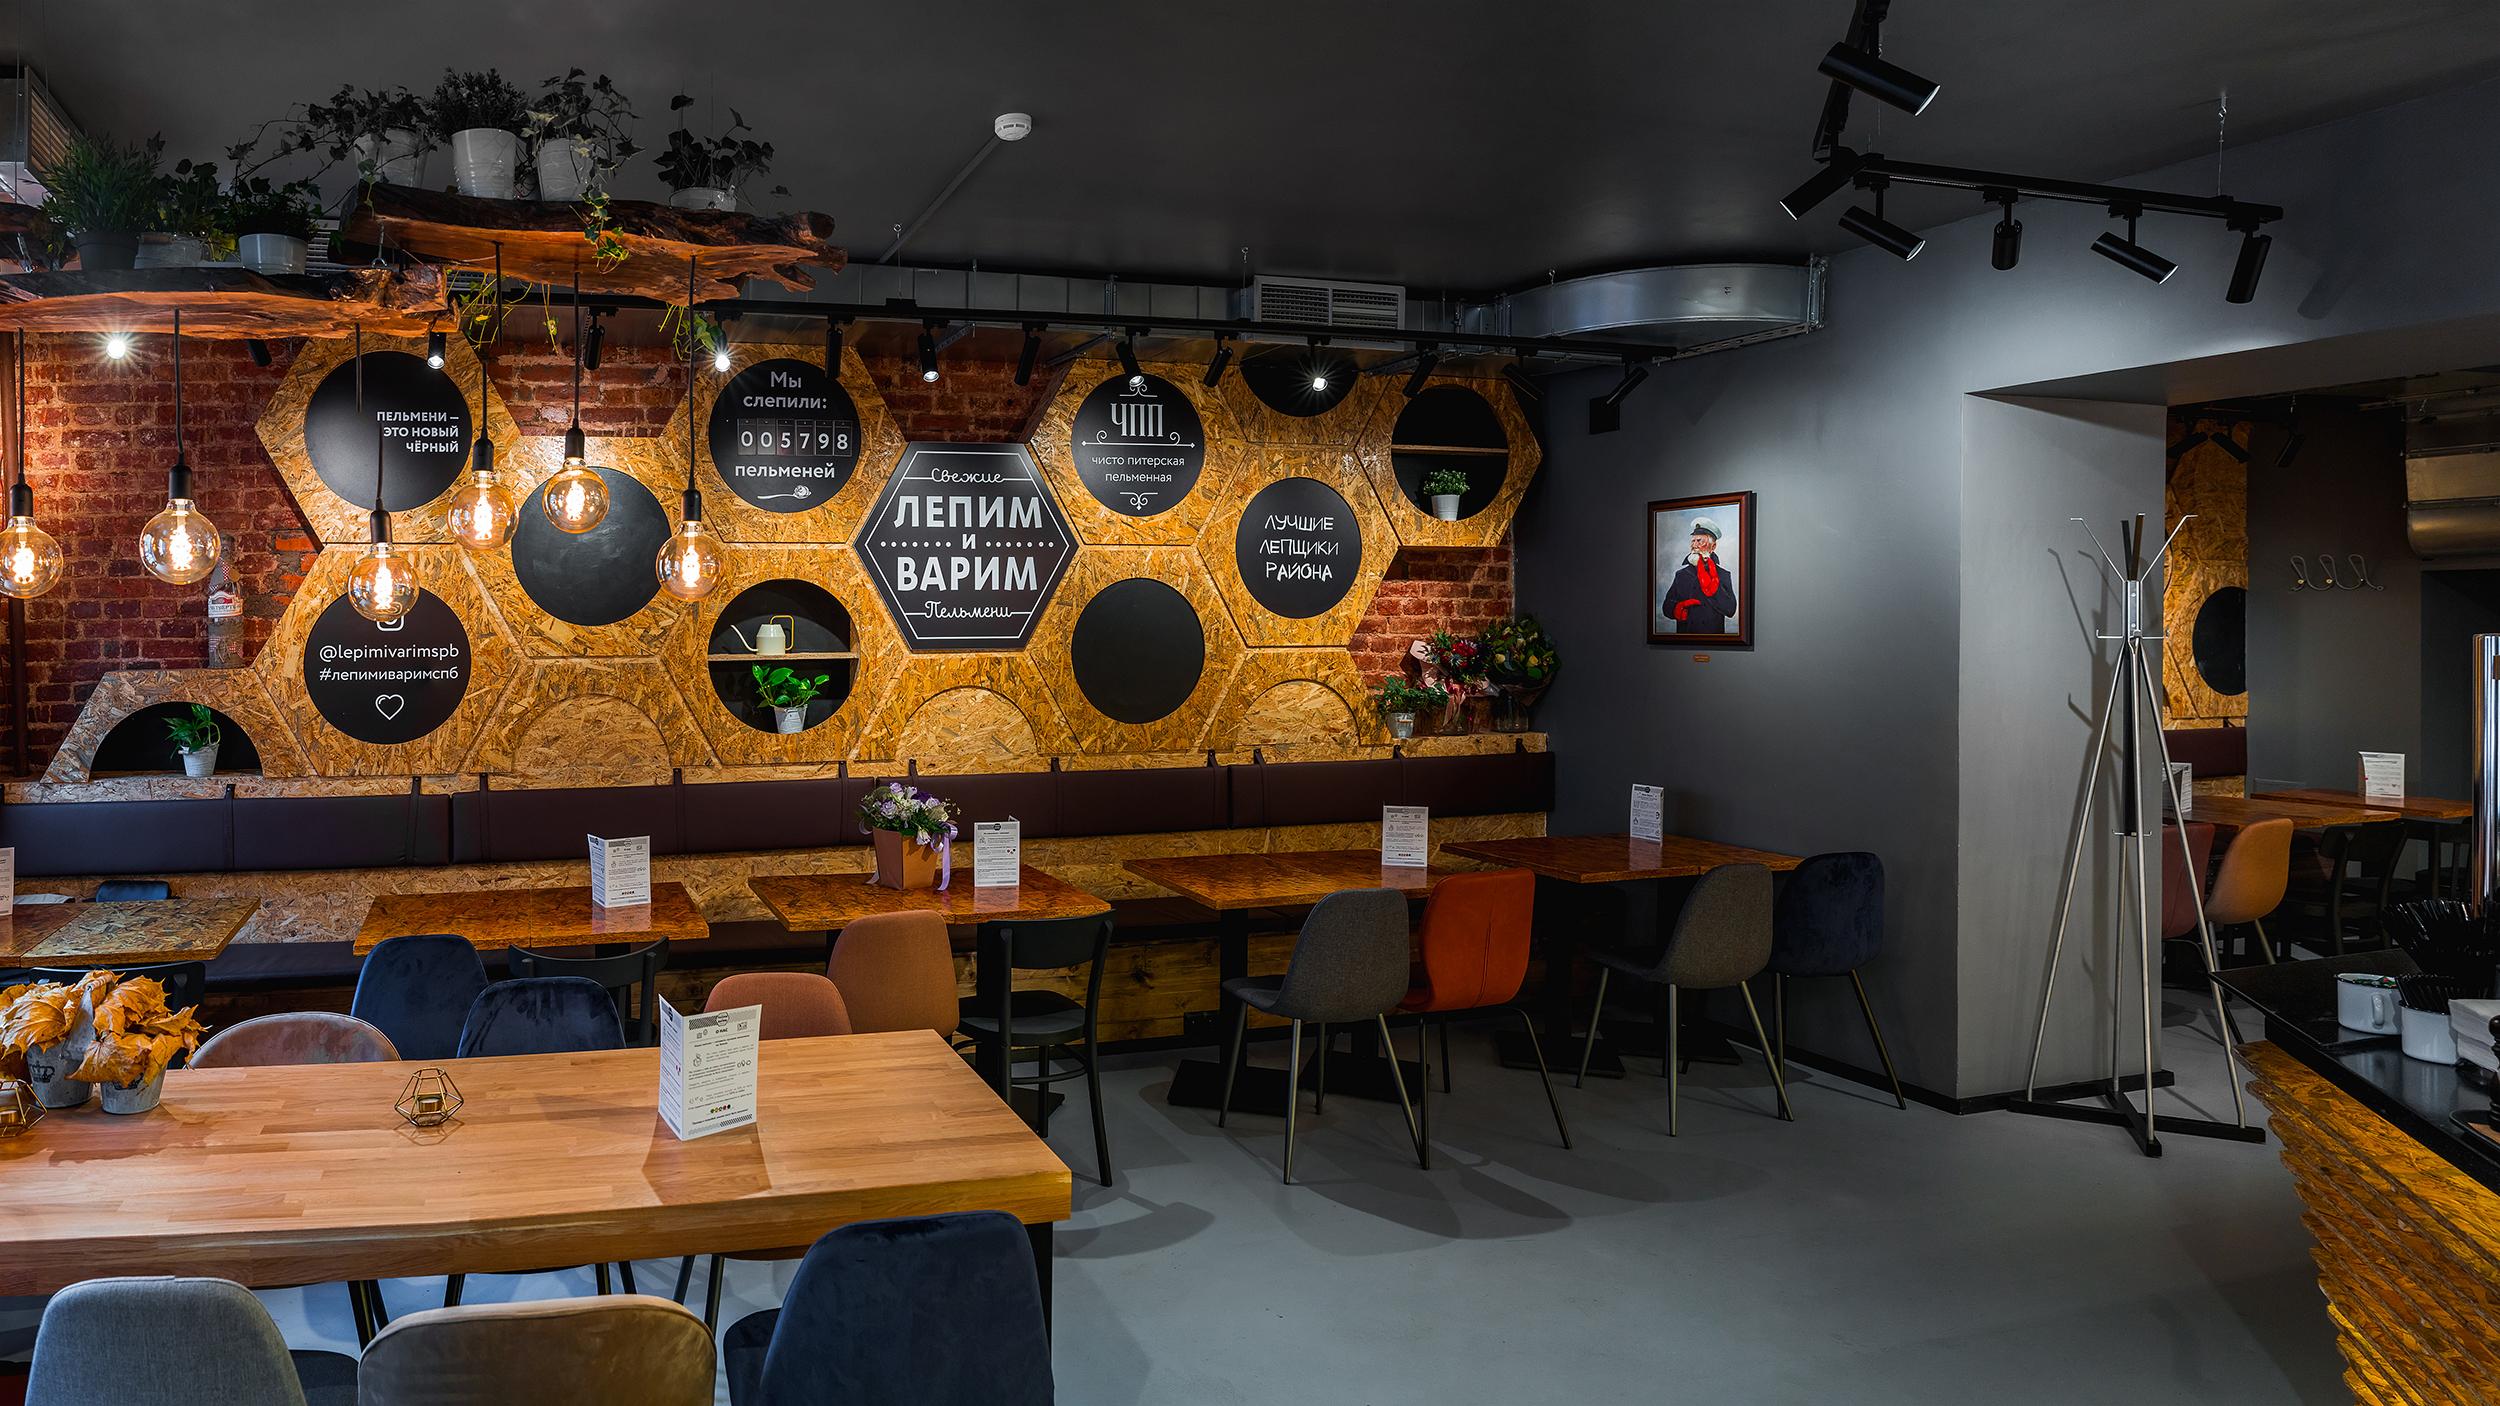 Фотография: Ресторан Лепим и варим